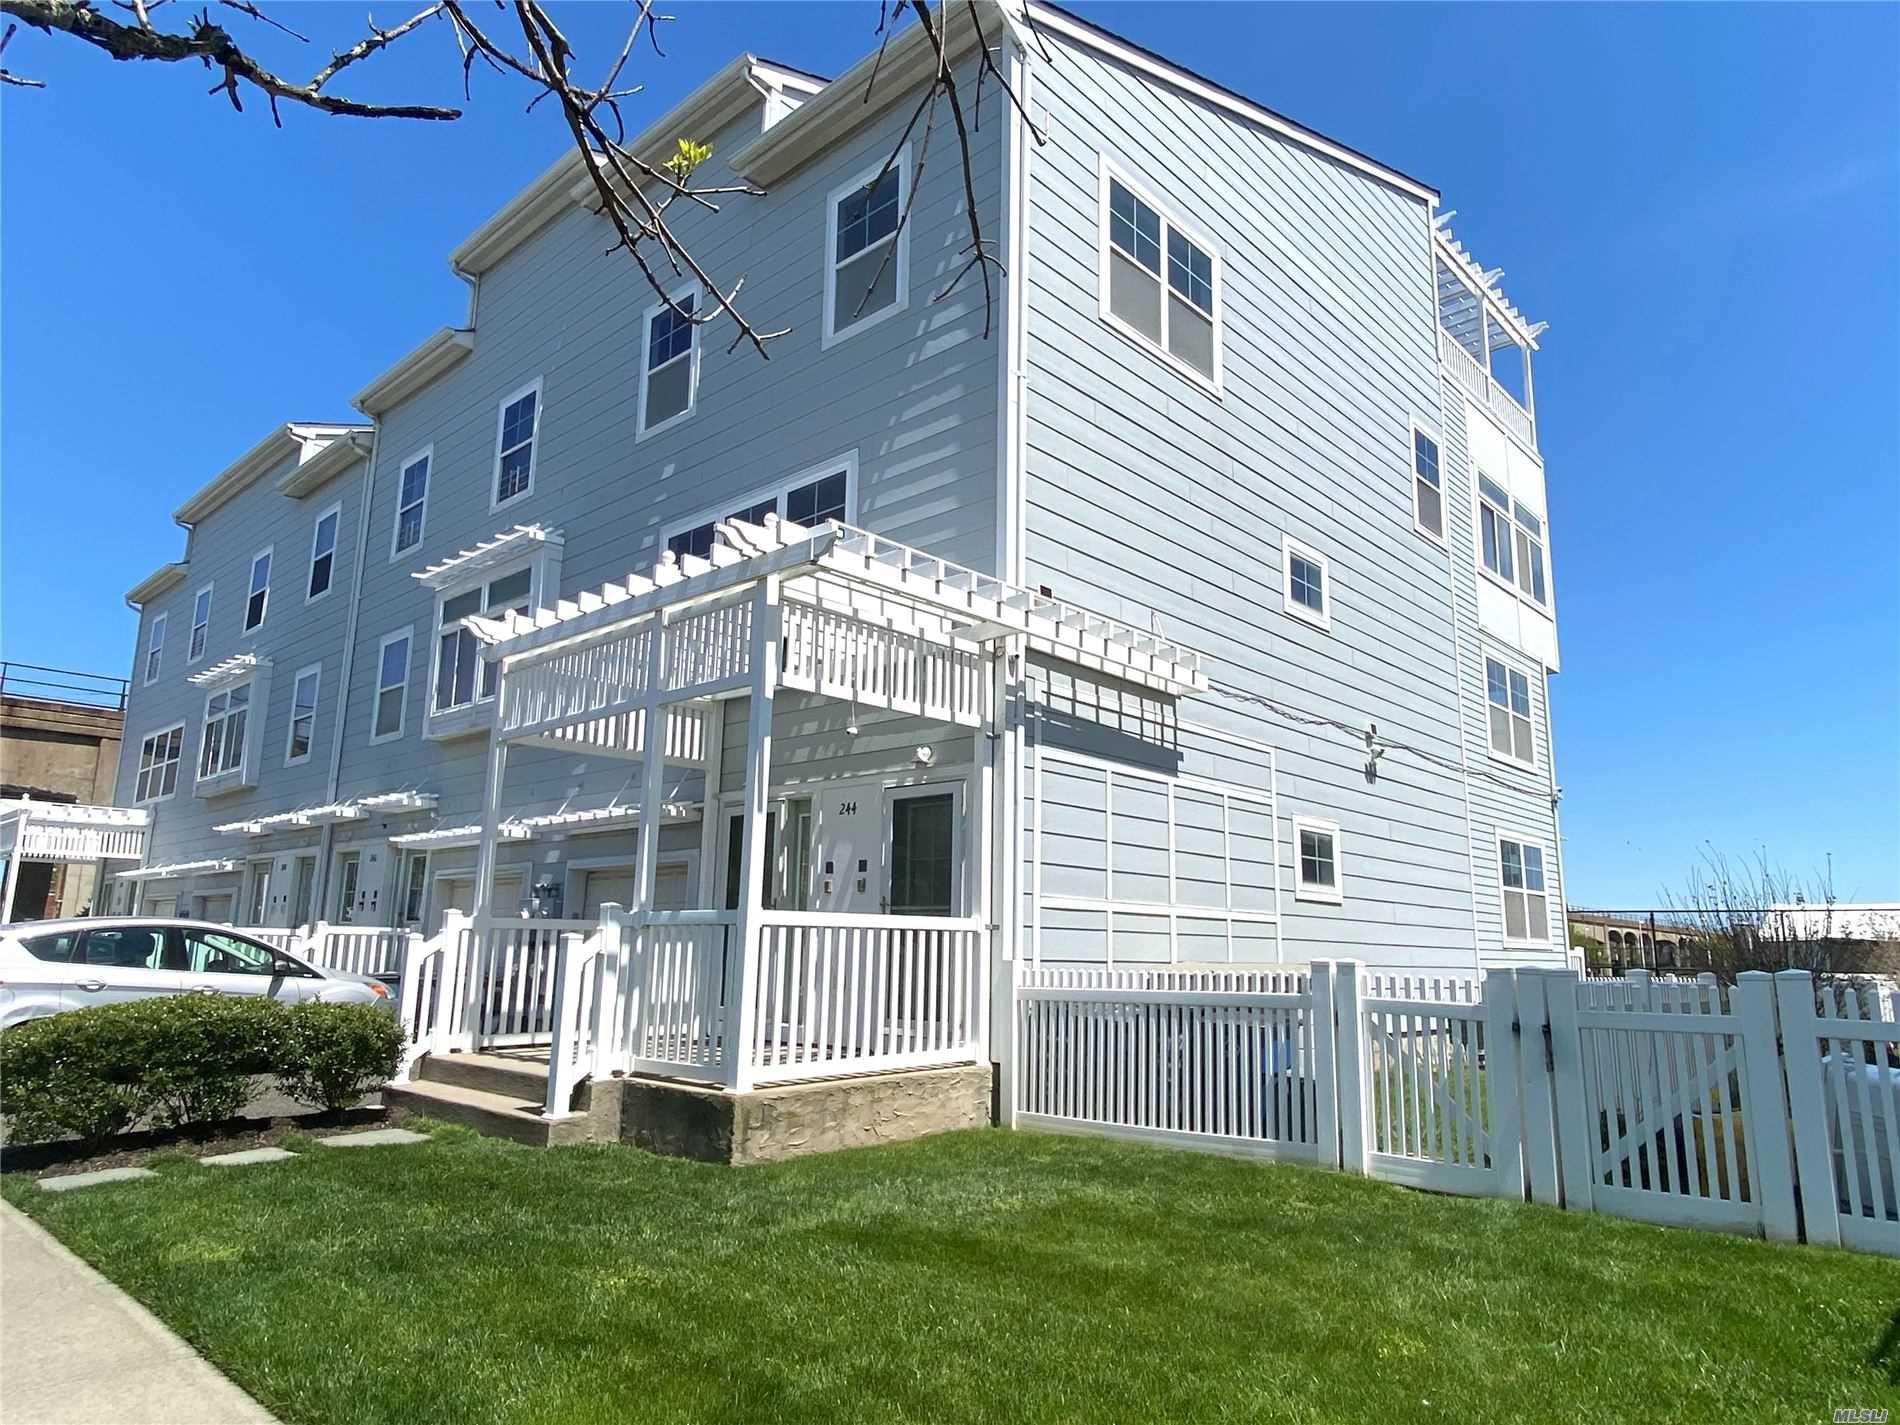 244 Beach Breeze Pl, Arverne, NY 11692 - MLS#: 3215265